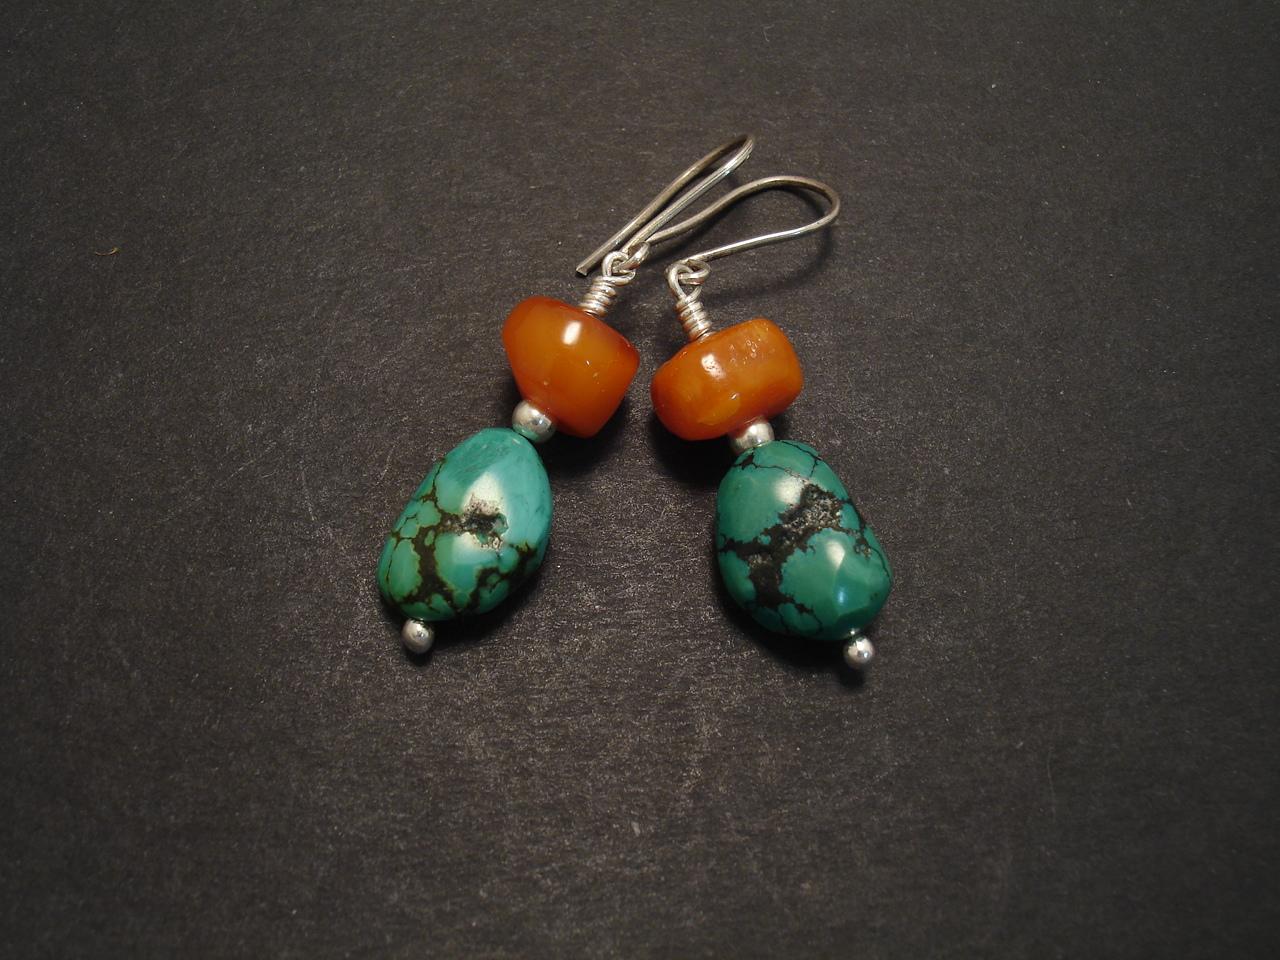 cf7427dcf Old Tibetan Turquoise Earrings - Christopher William Sydney ...